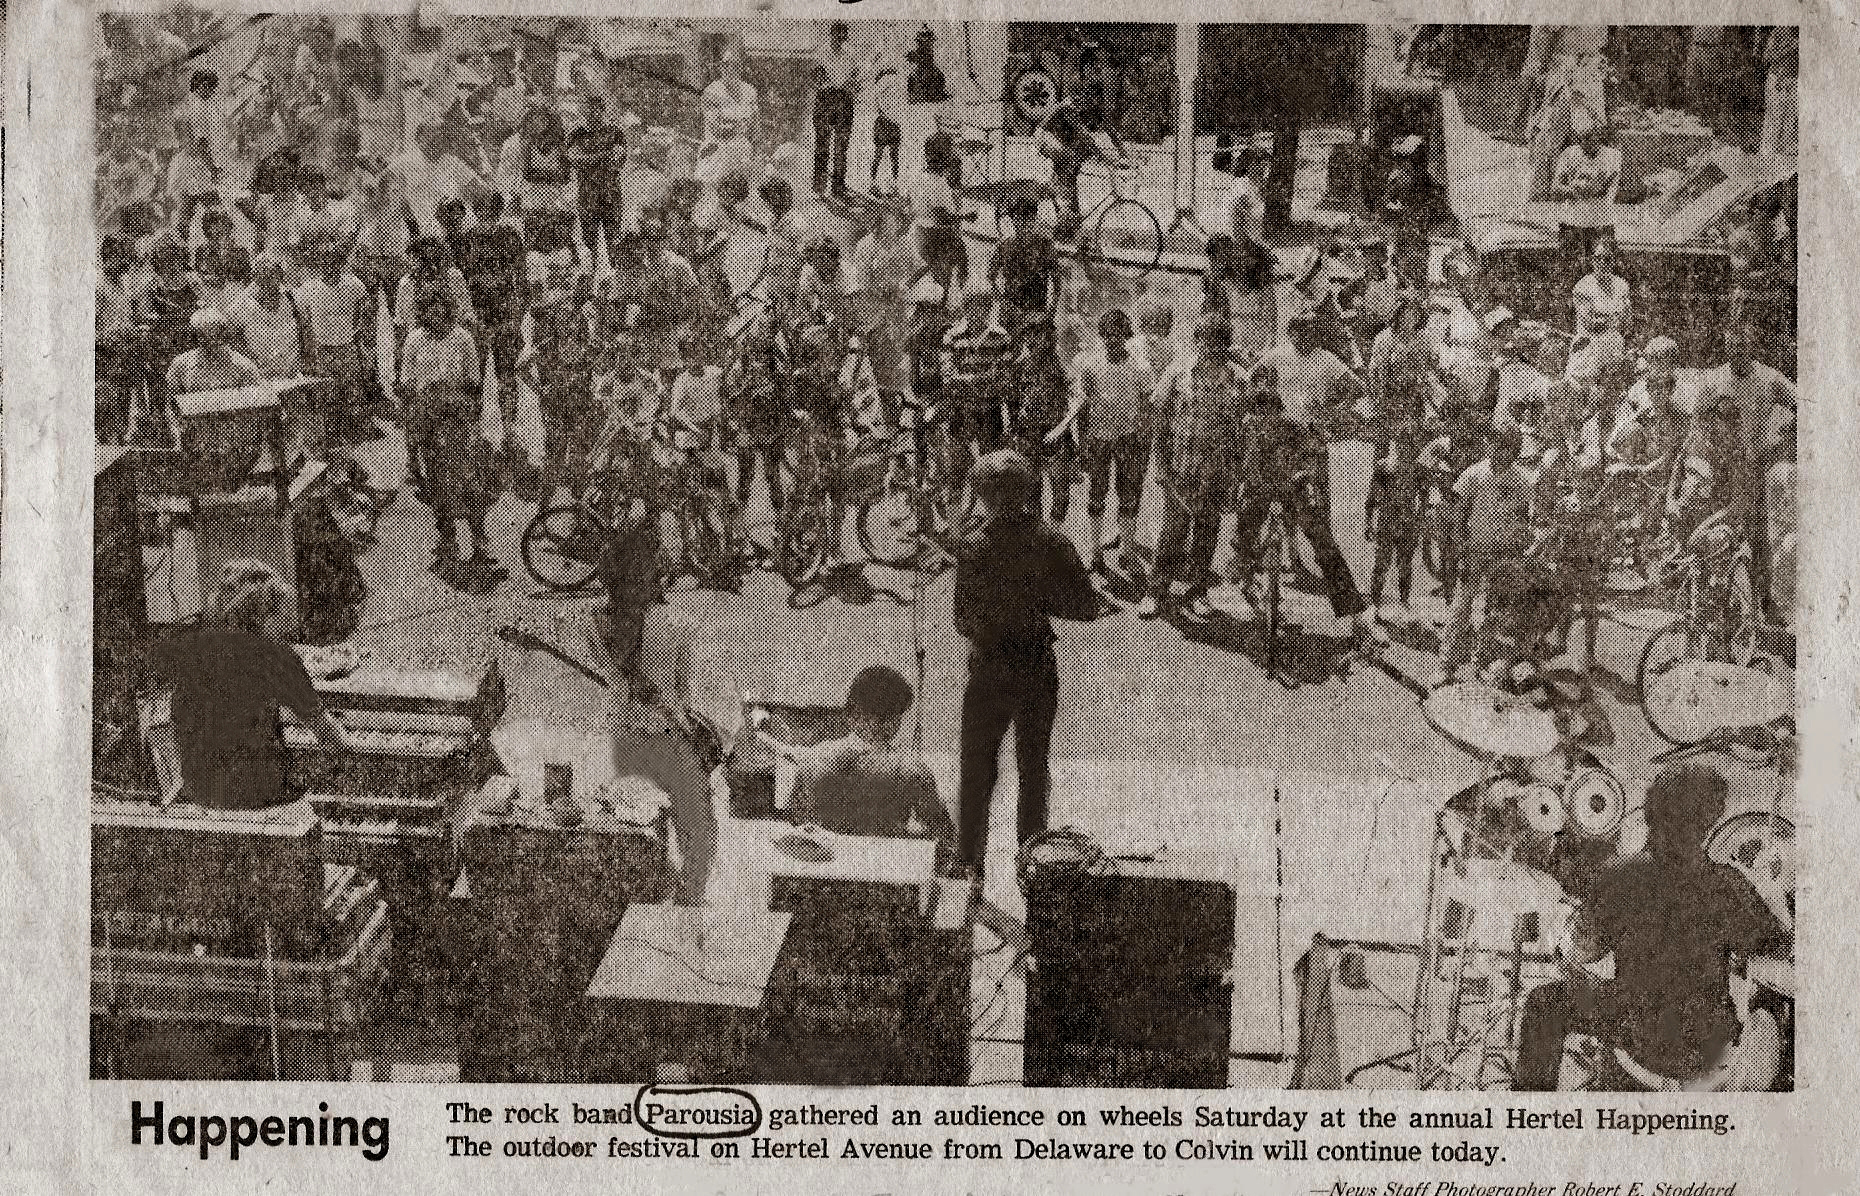 Buffalo Evening News  - Hertel Happening 08.01.1981. Delaware to Colvin Ave